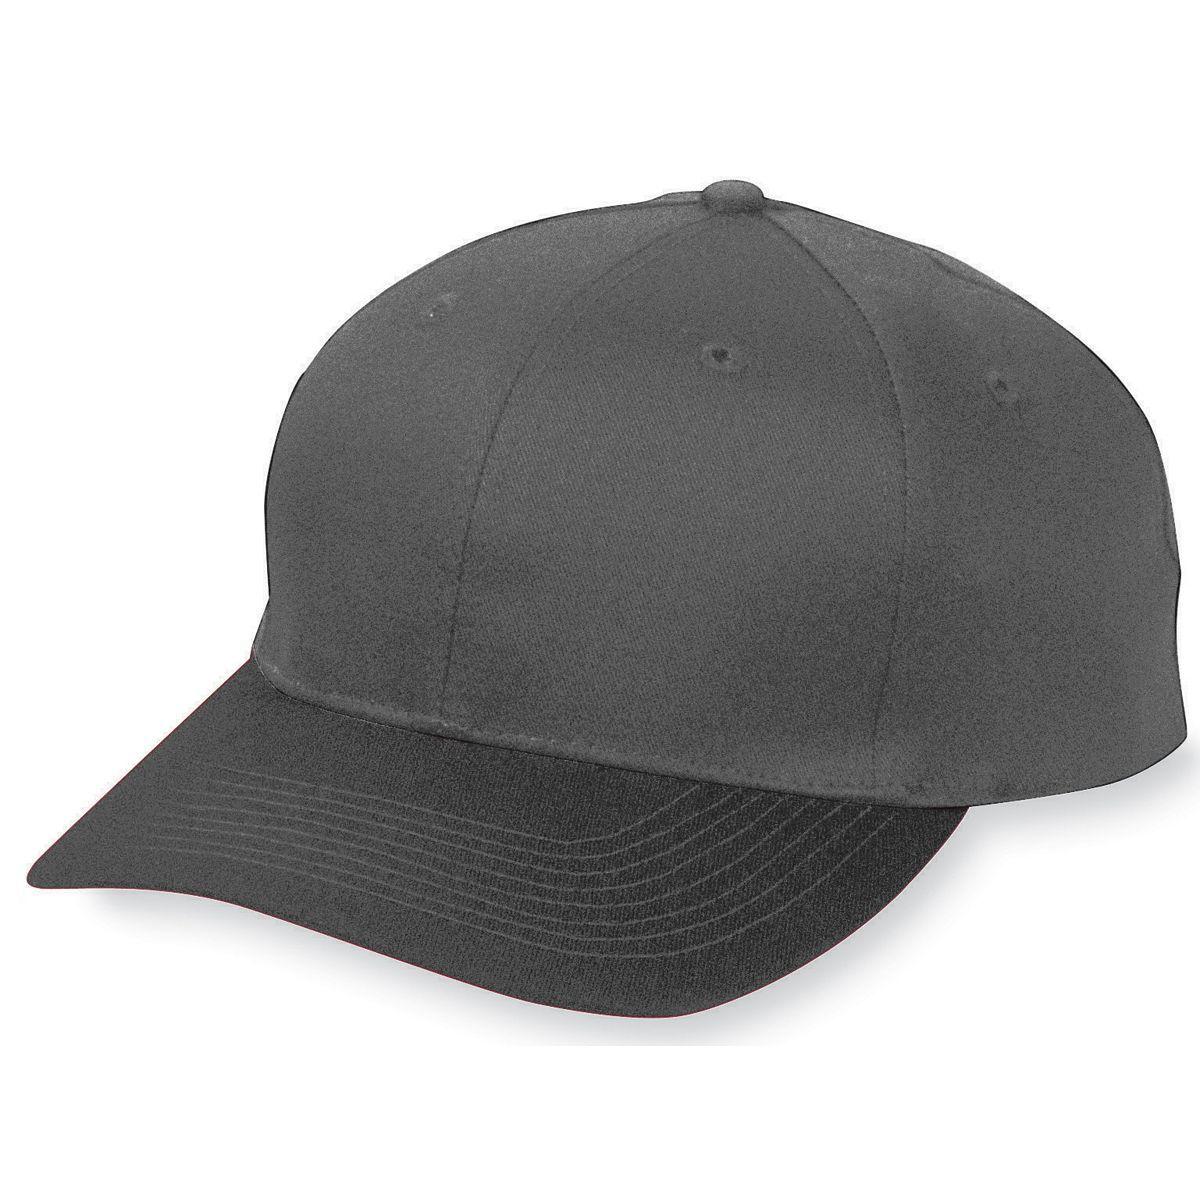 Youth Six-Panel Cotton Twill Low-Profile Cap - BLACK